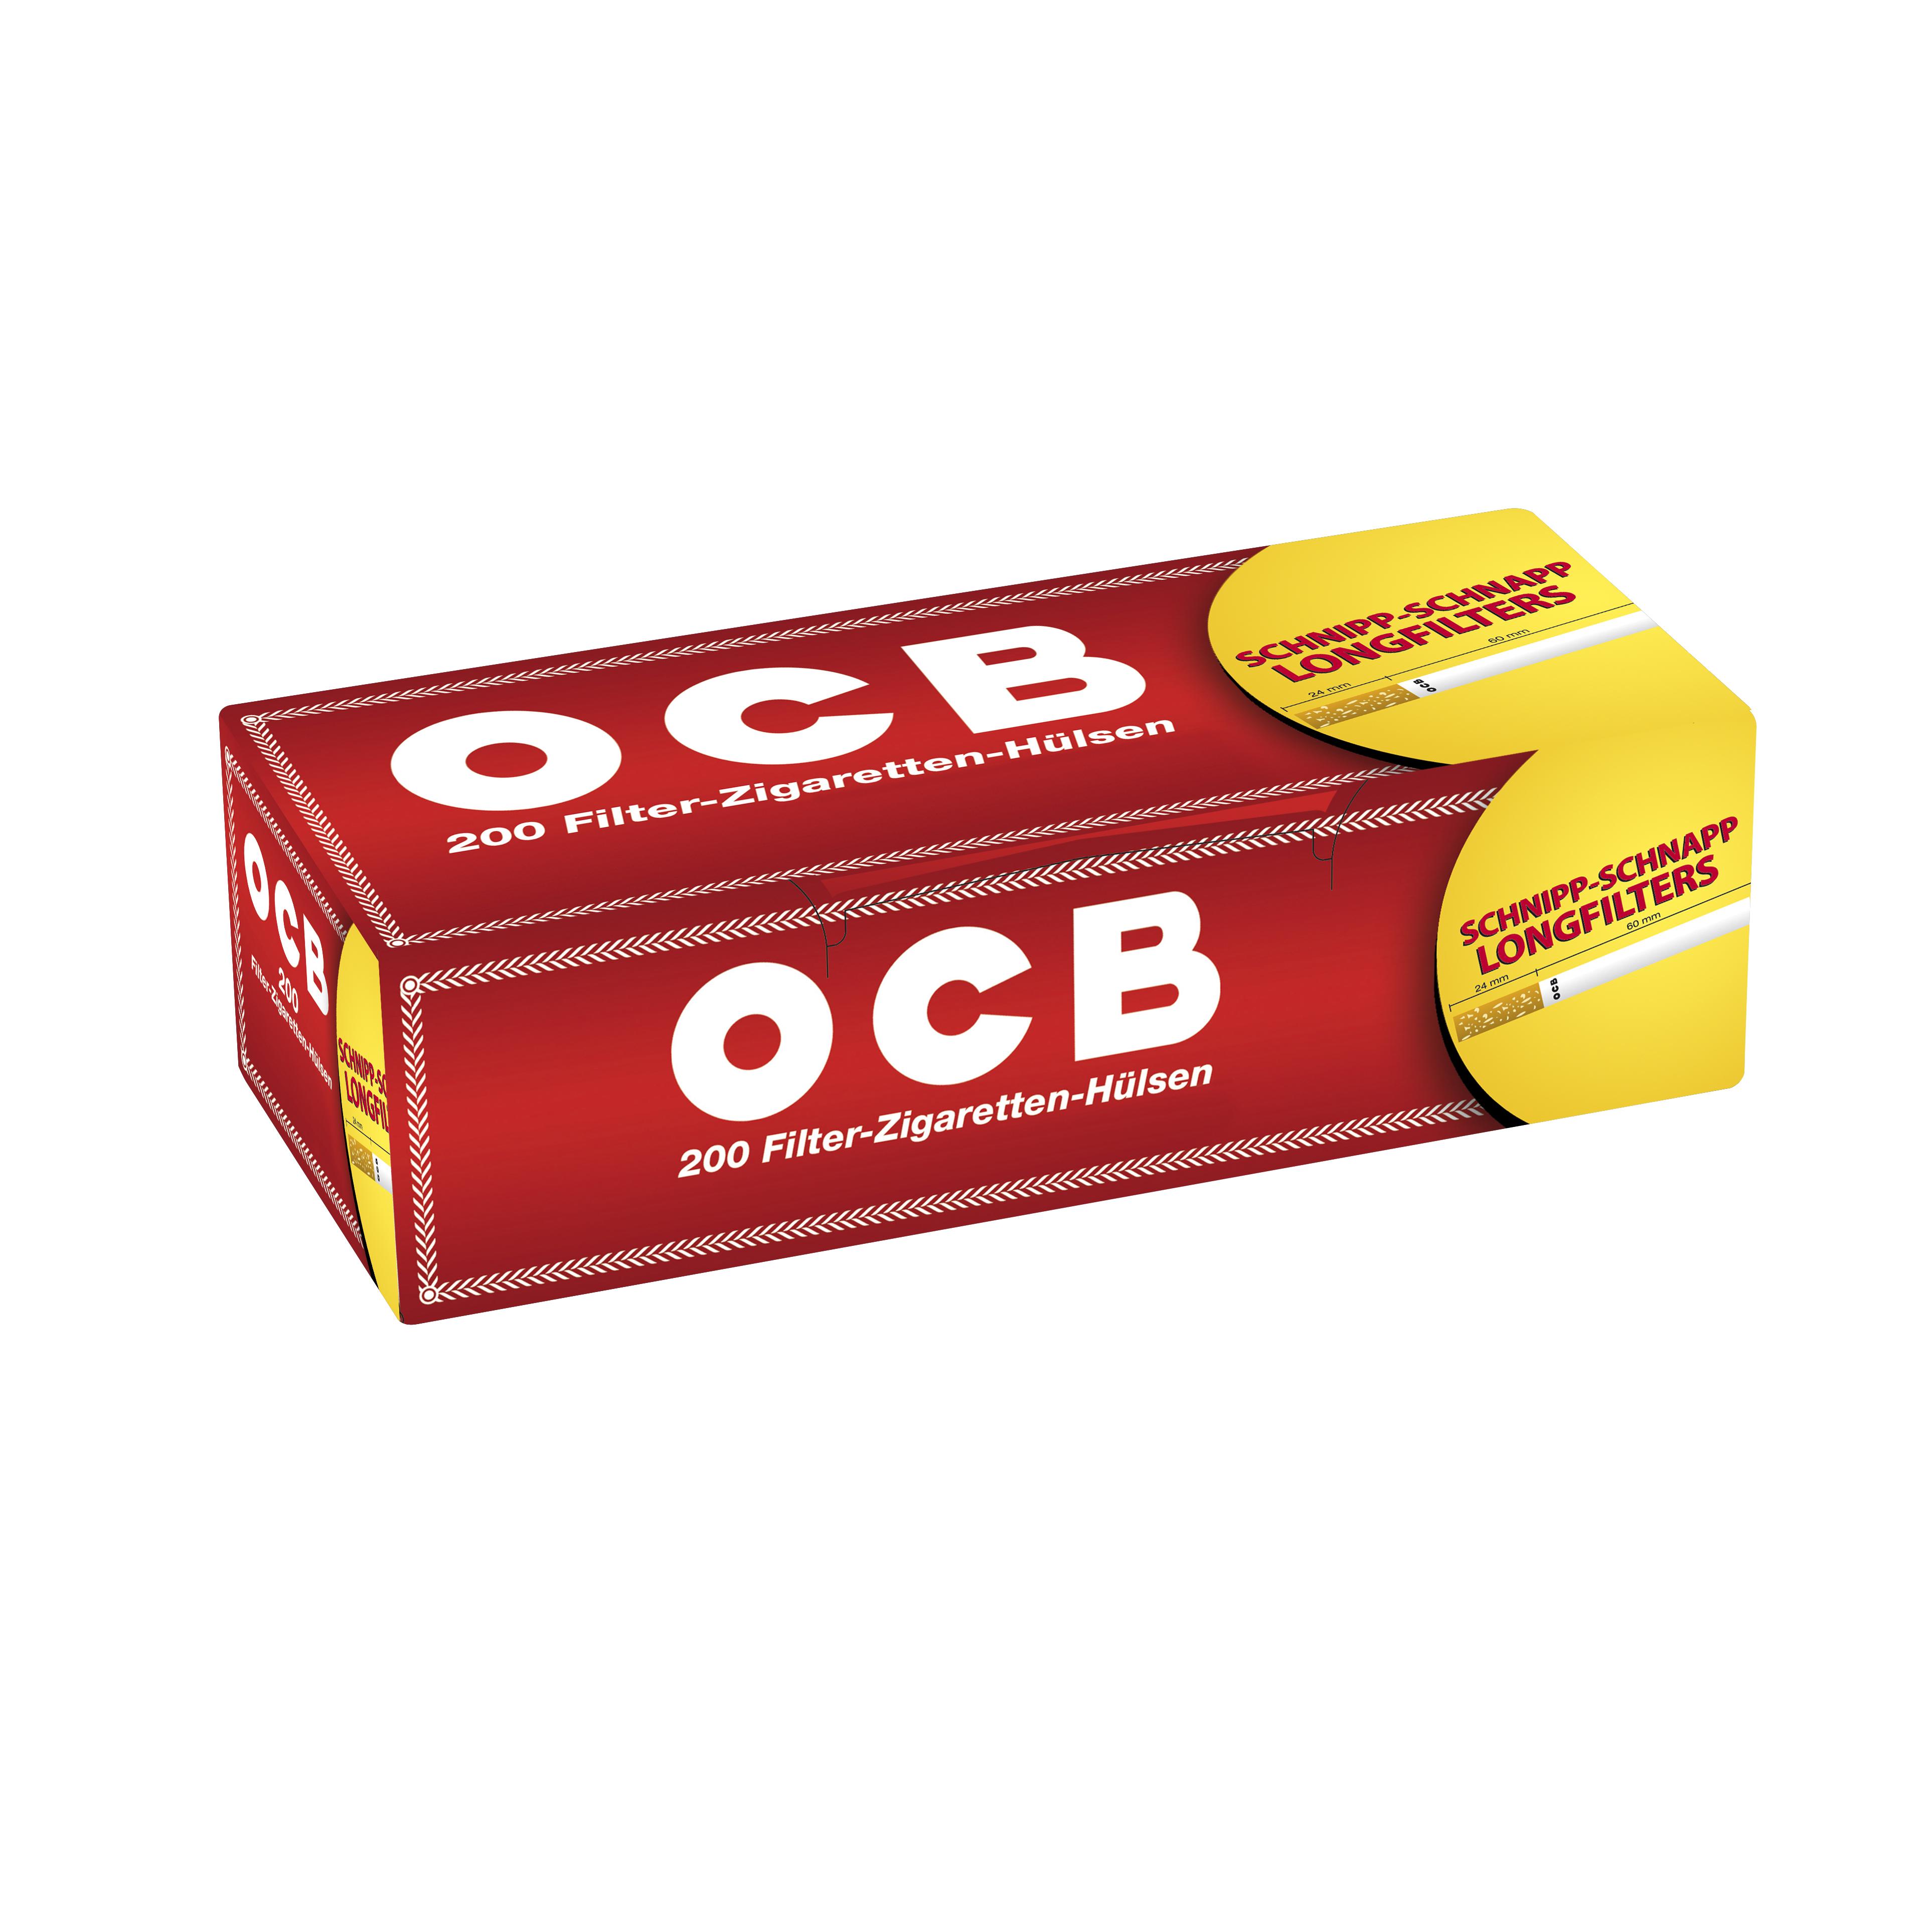 OCB tubes 200 long 2